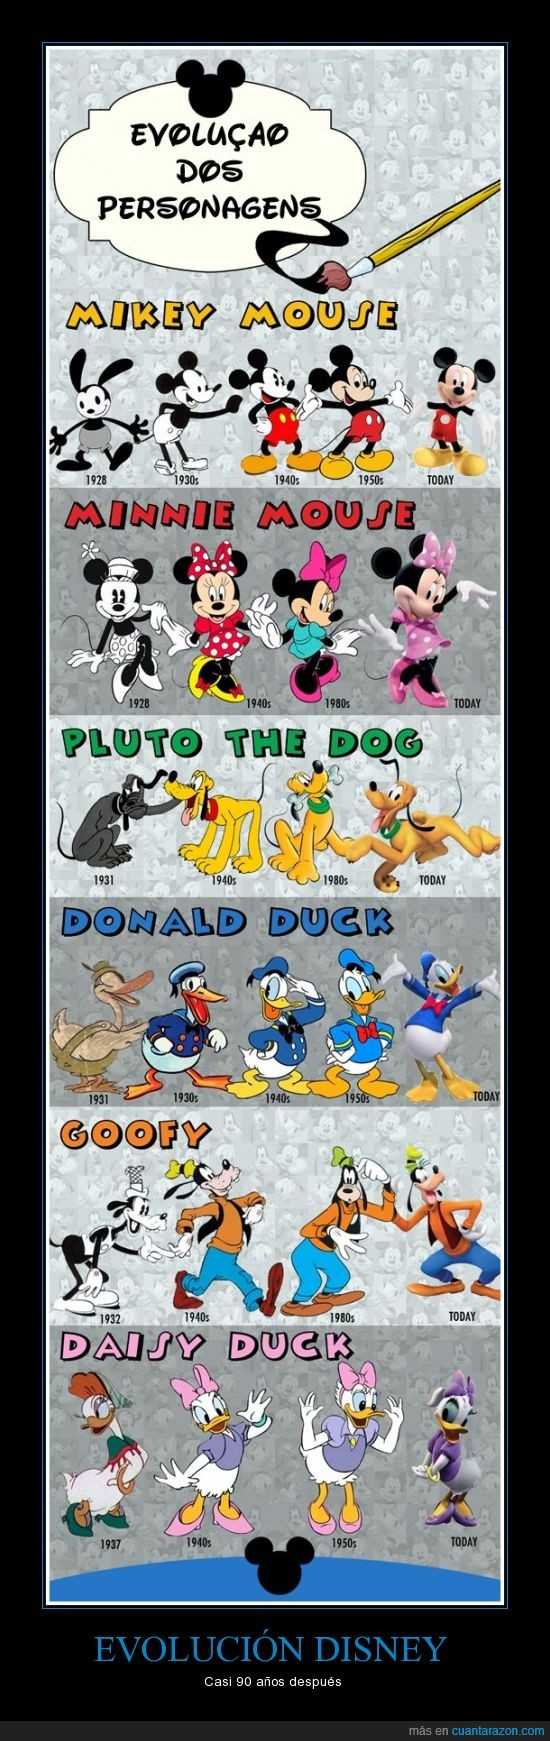 daisy era la pantoja,disney,donald,evolucion,goofy,mickey,minnie,pantoja pls,pluto